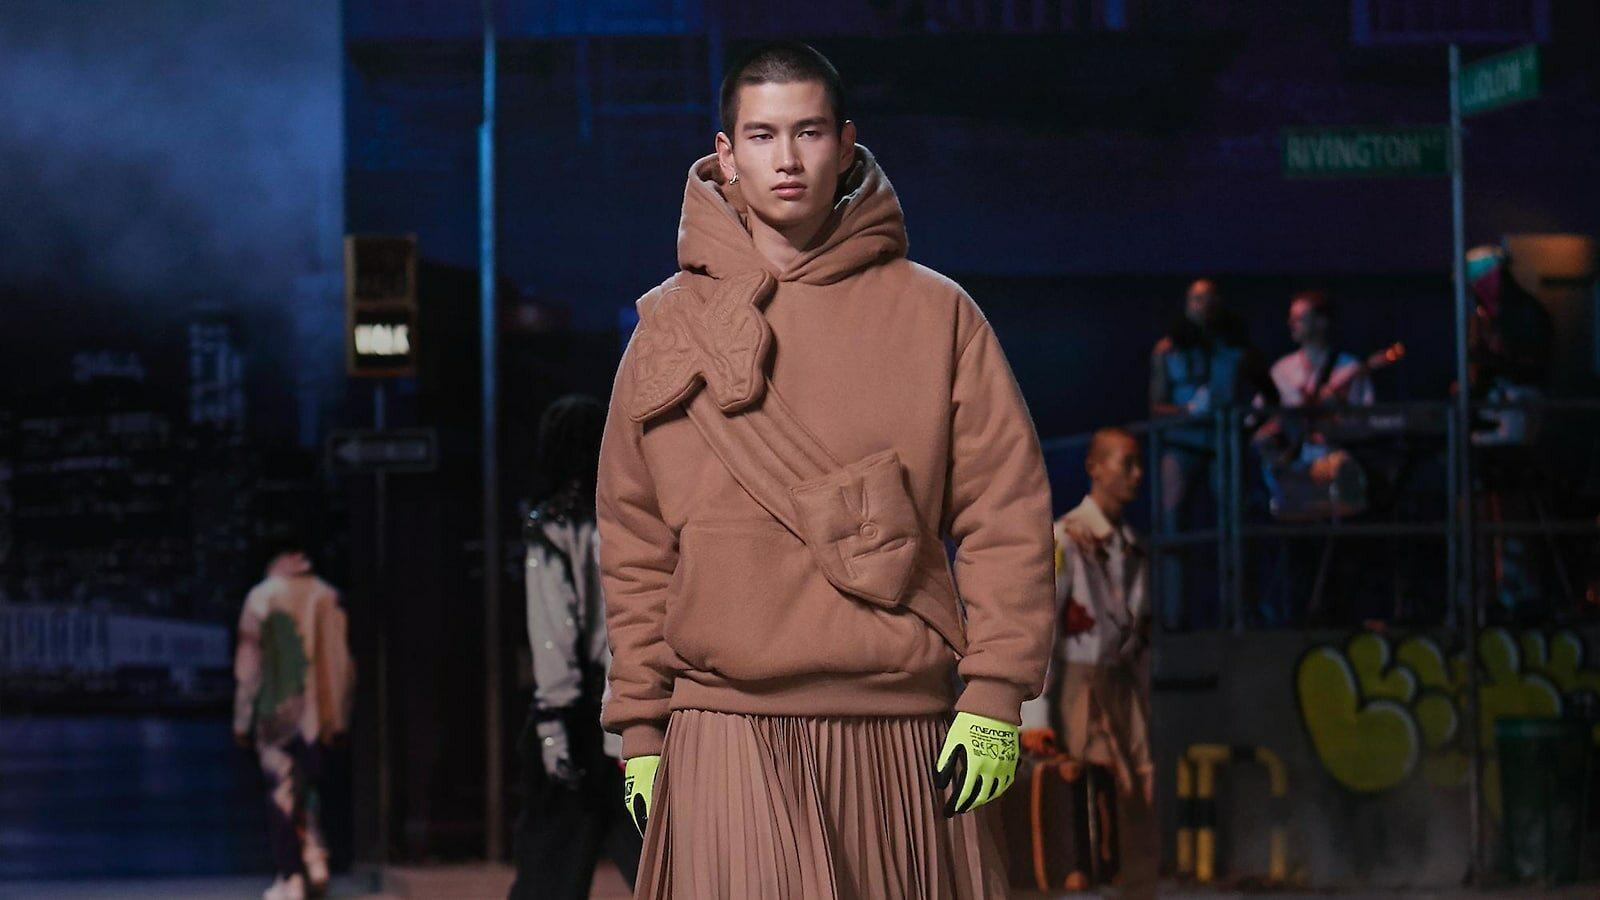 Kolekcja Louis Vuitton na sezon jesień/zima 2019/2020